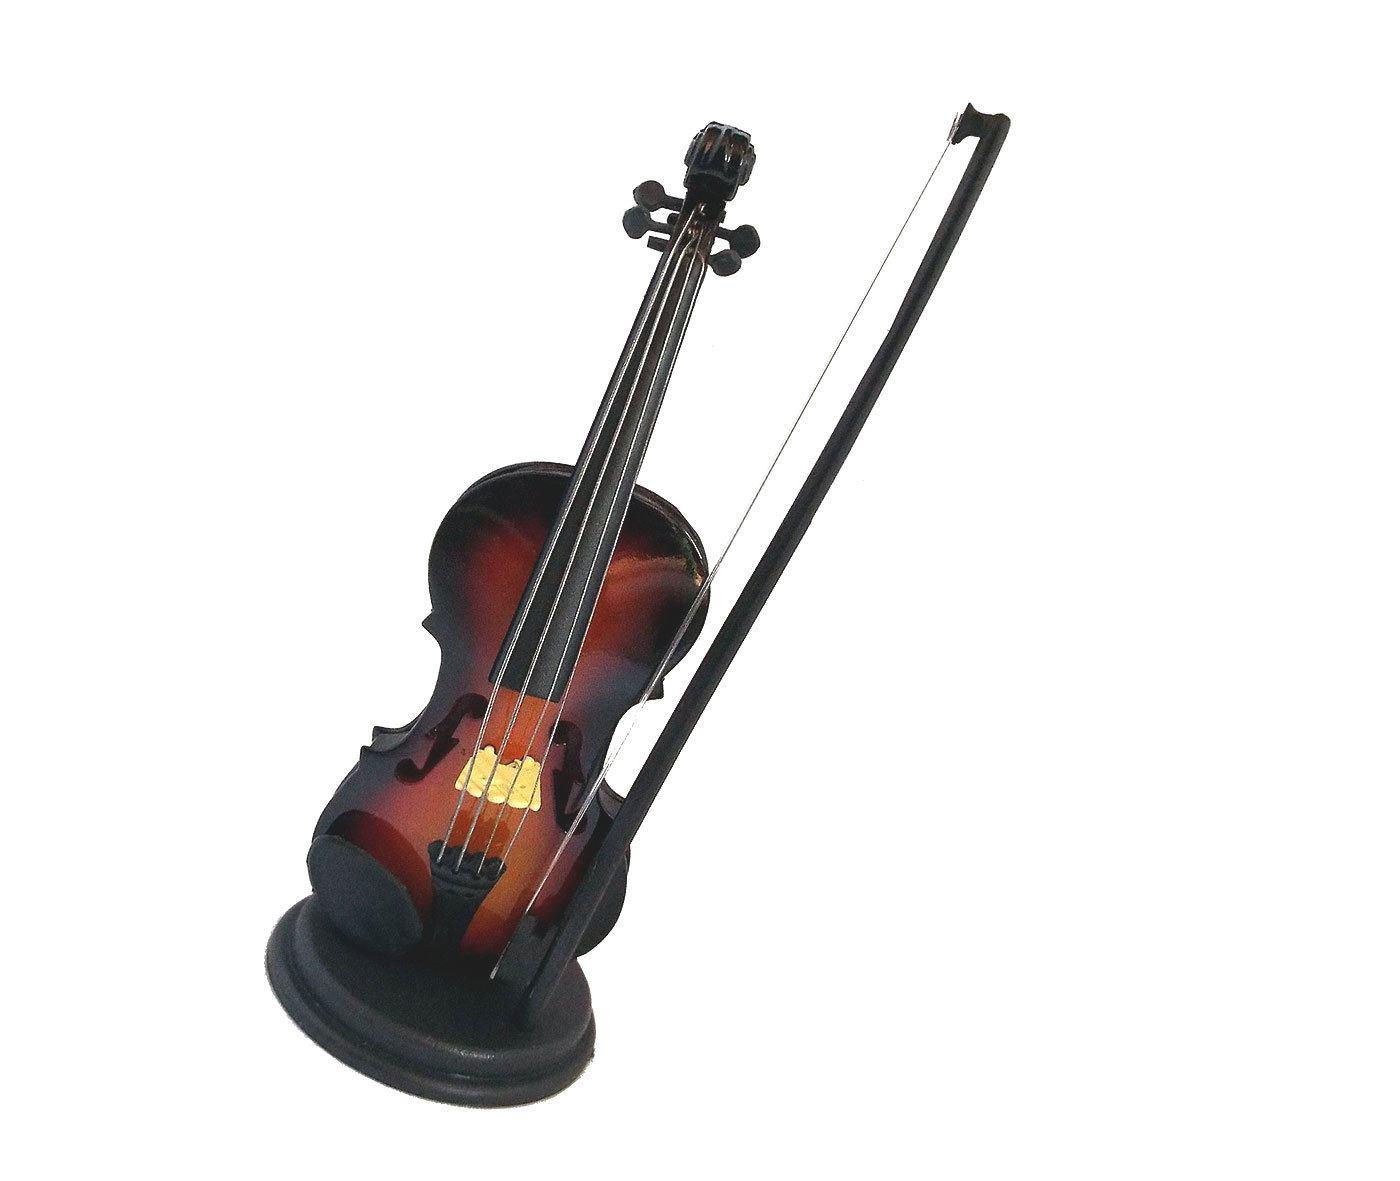 Miniatura violino 15 cm